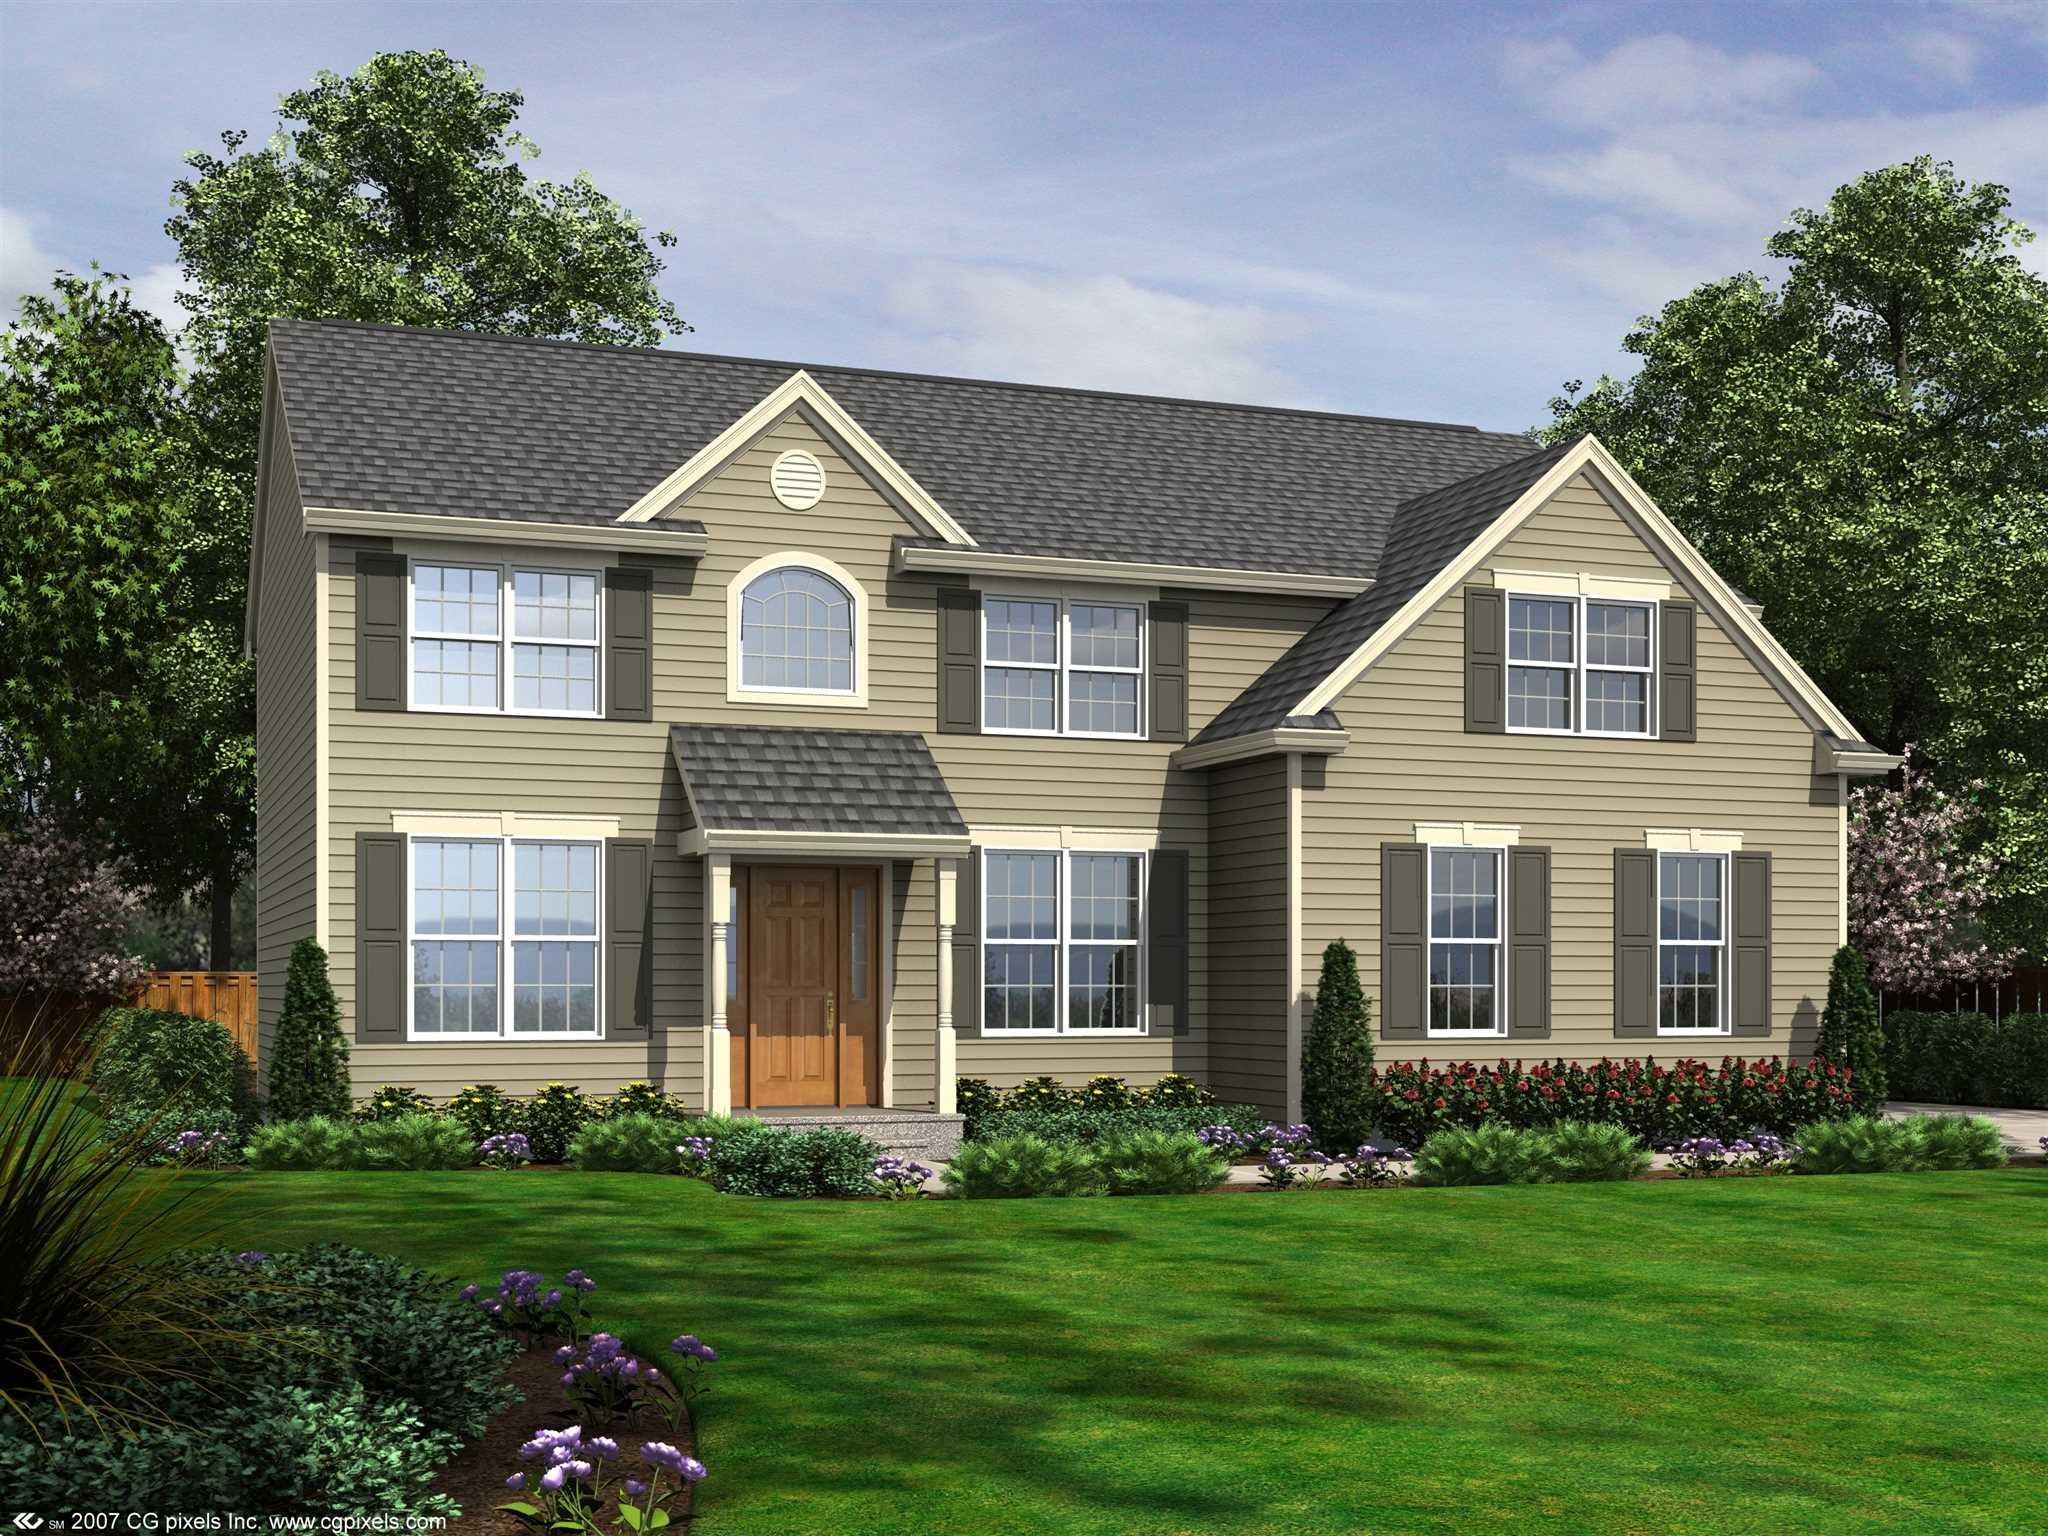 Single Family Home for Sale at 861 LATTINTOWN ROAD 861 LATTINTOWN ROAD Marlborough, New York 12547 United States